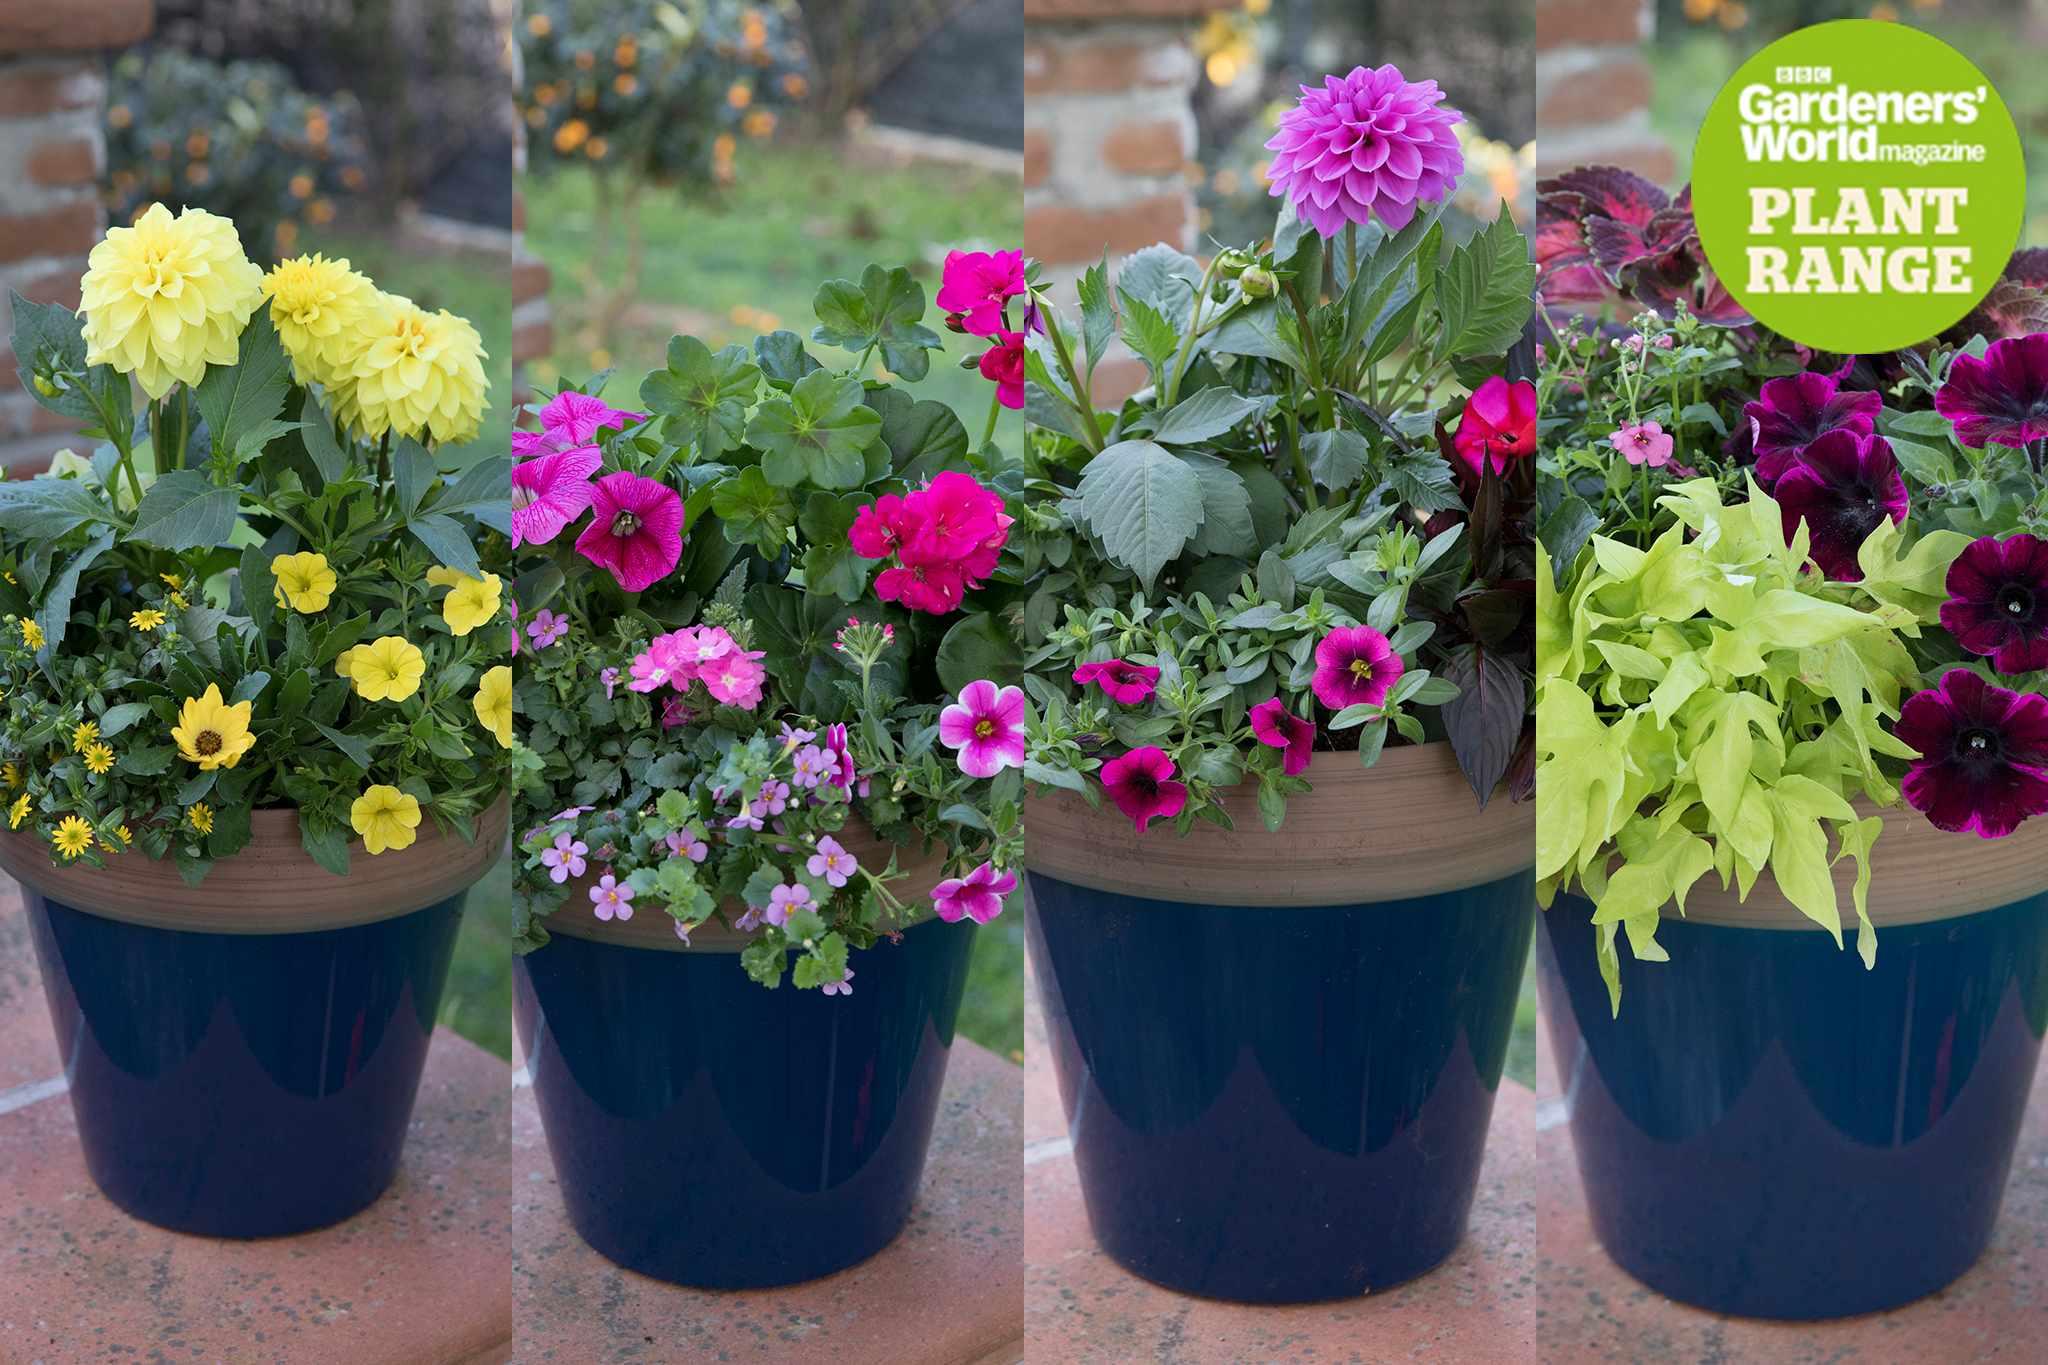 BBC Gardeners' World Magazine plant range, one to four